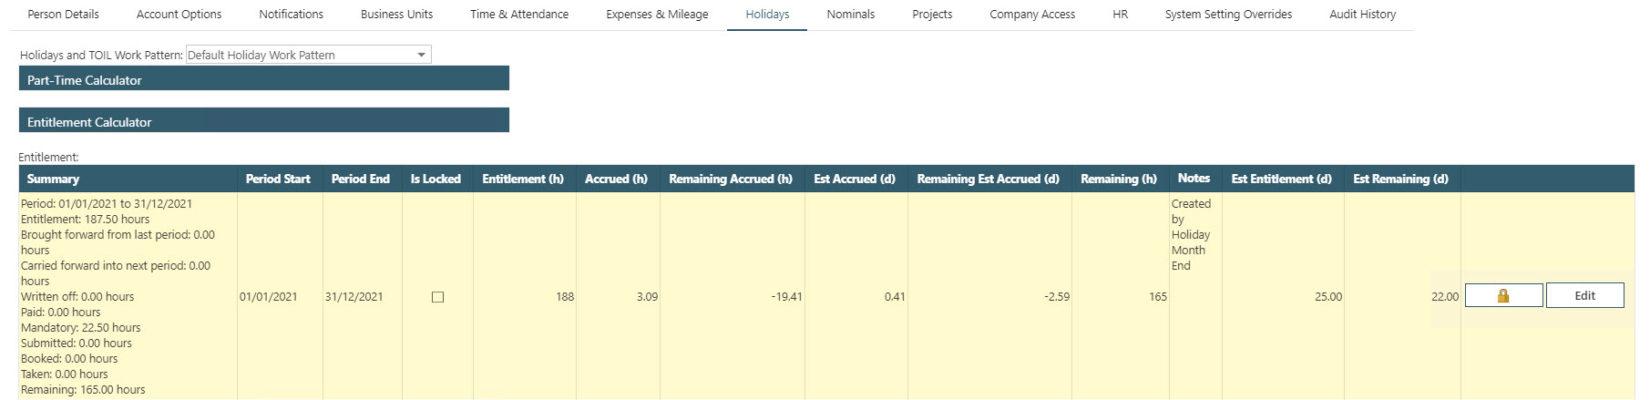 Sicon WAP Holidays Help and User Guide - WAP Holidays HUG Section 10 - Image 2